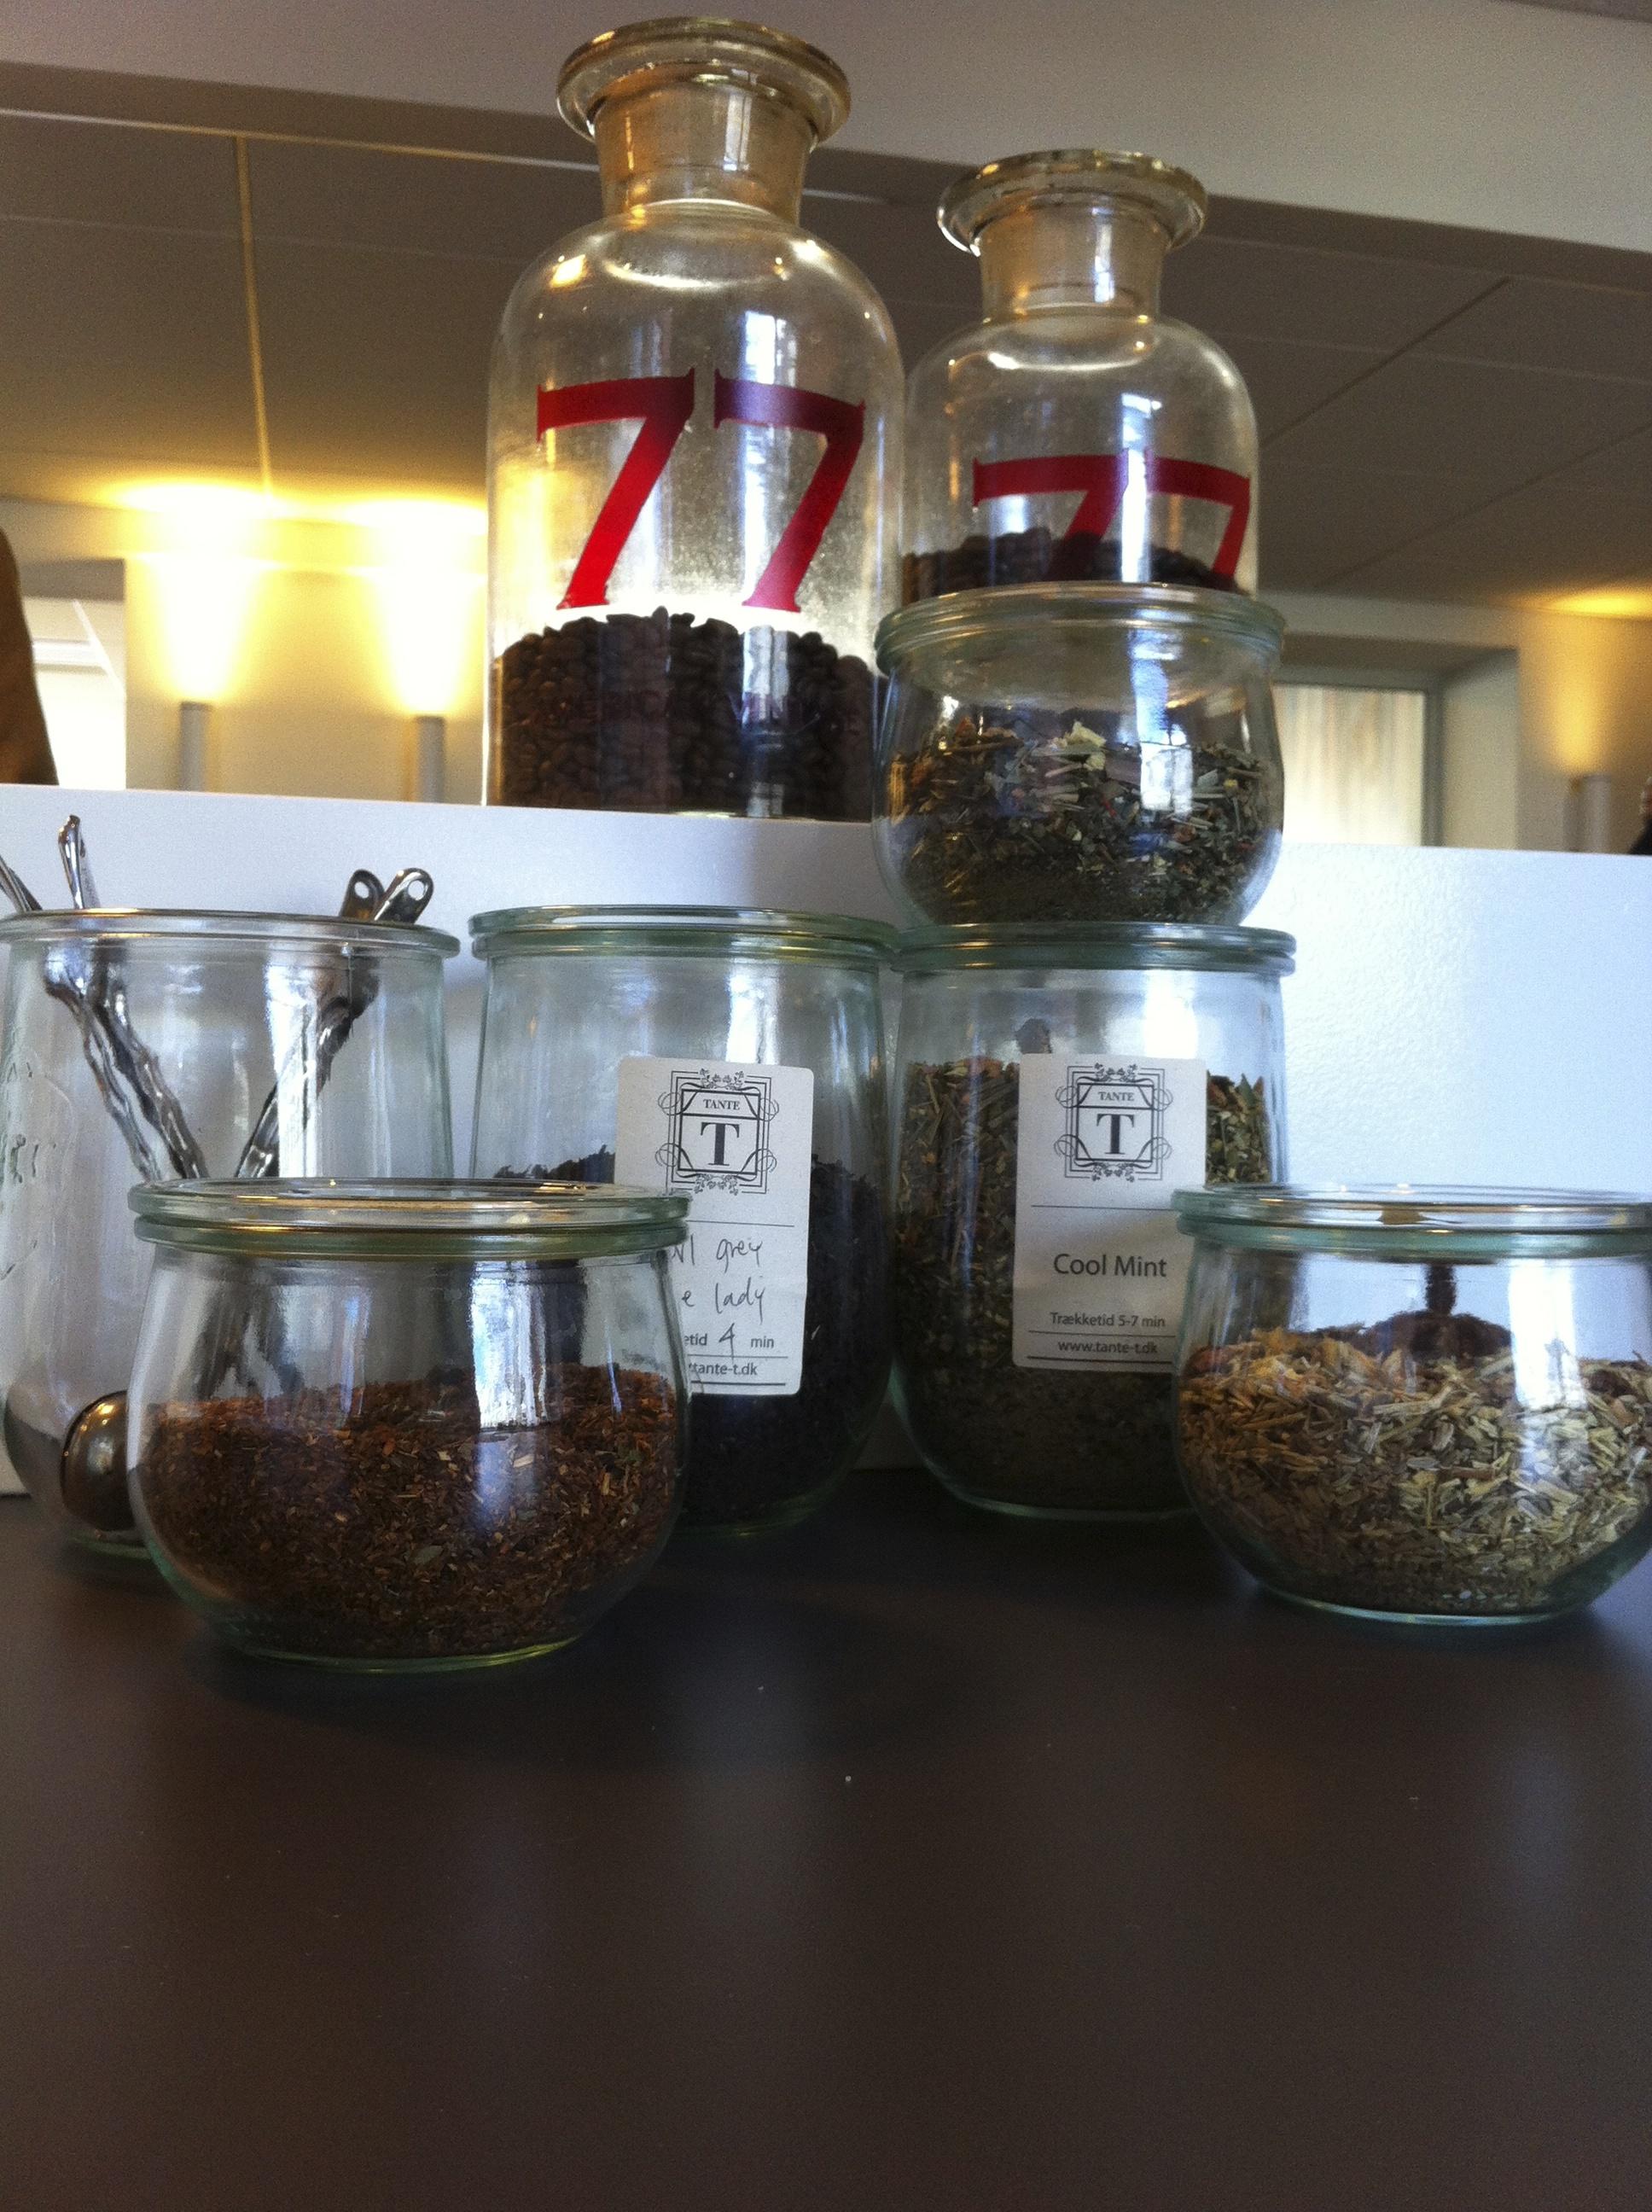 Coffee and tea lounge - no Pickwick here..